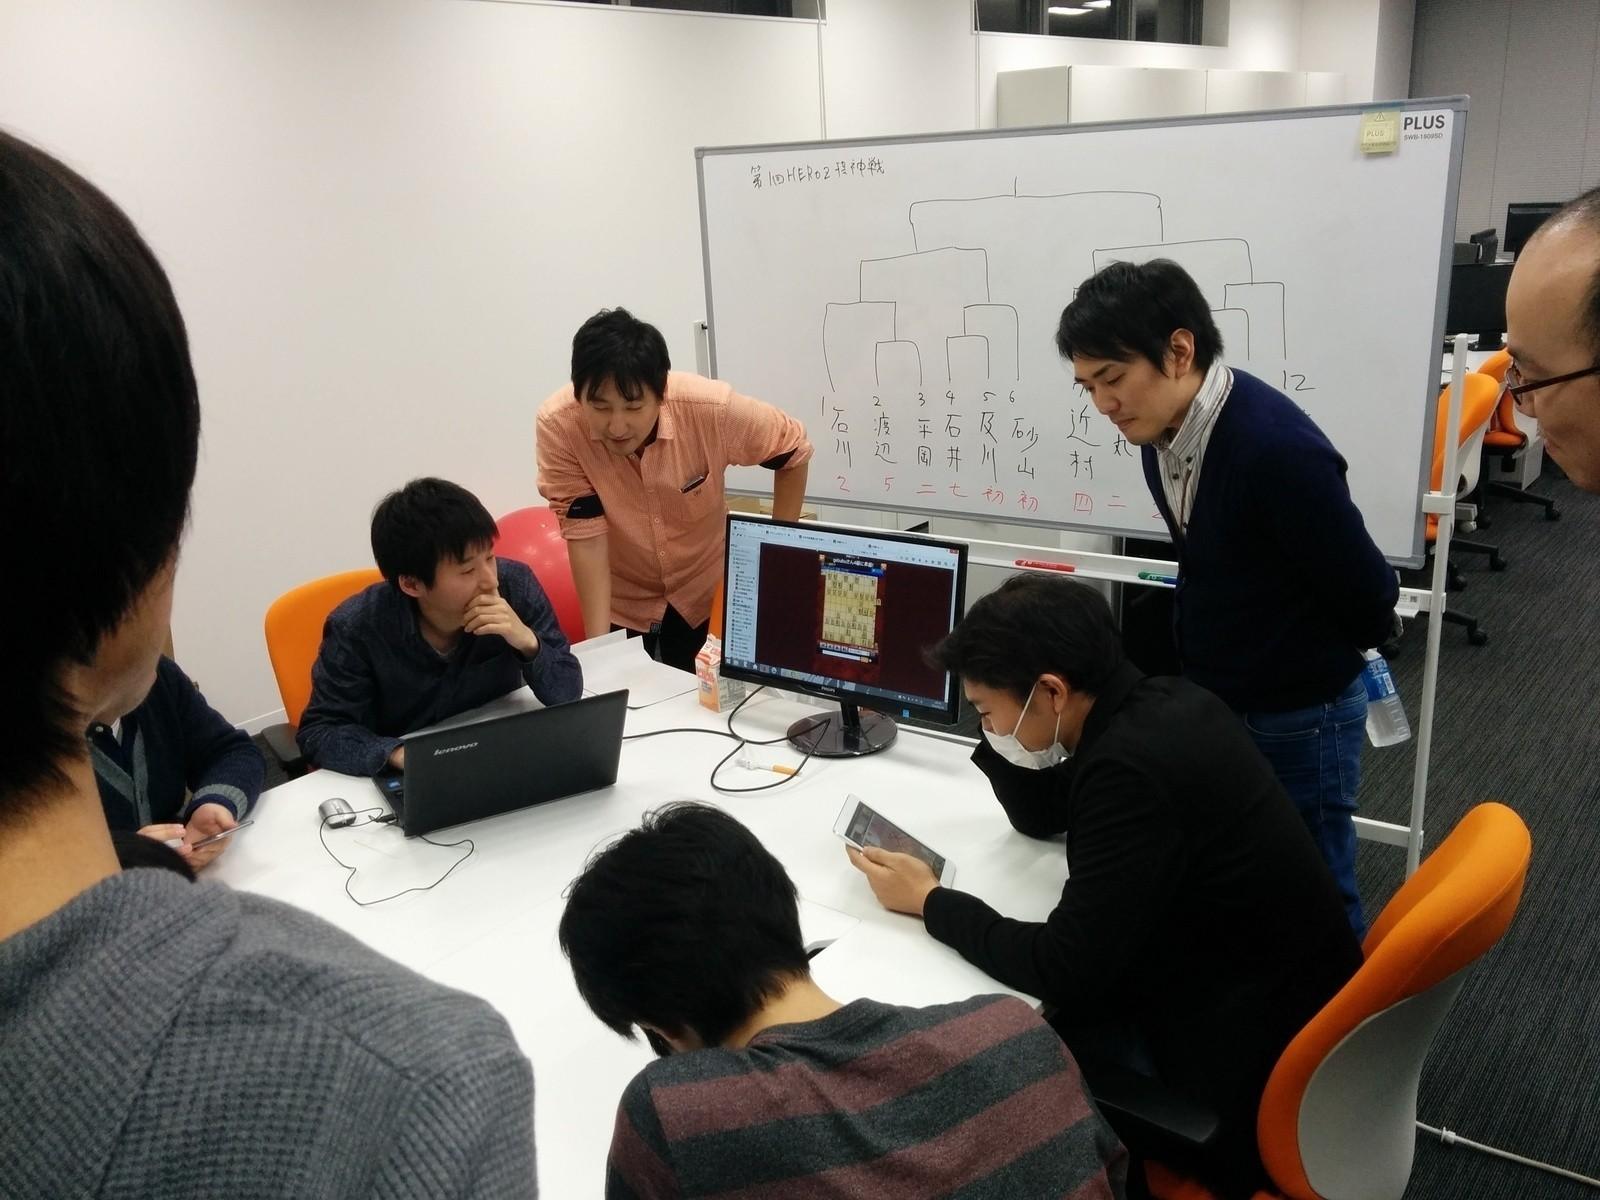 HEROZ株式会社・データサイエンティストを募集【世界最先端のAI技術を活用/集中・効率のスマートワーク環境】